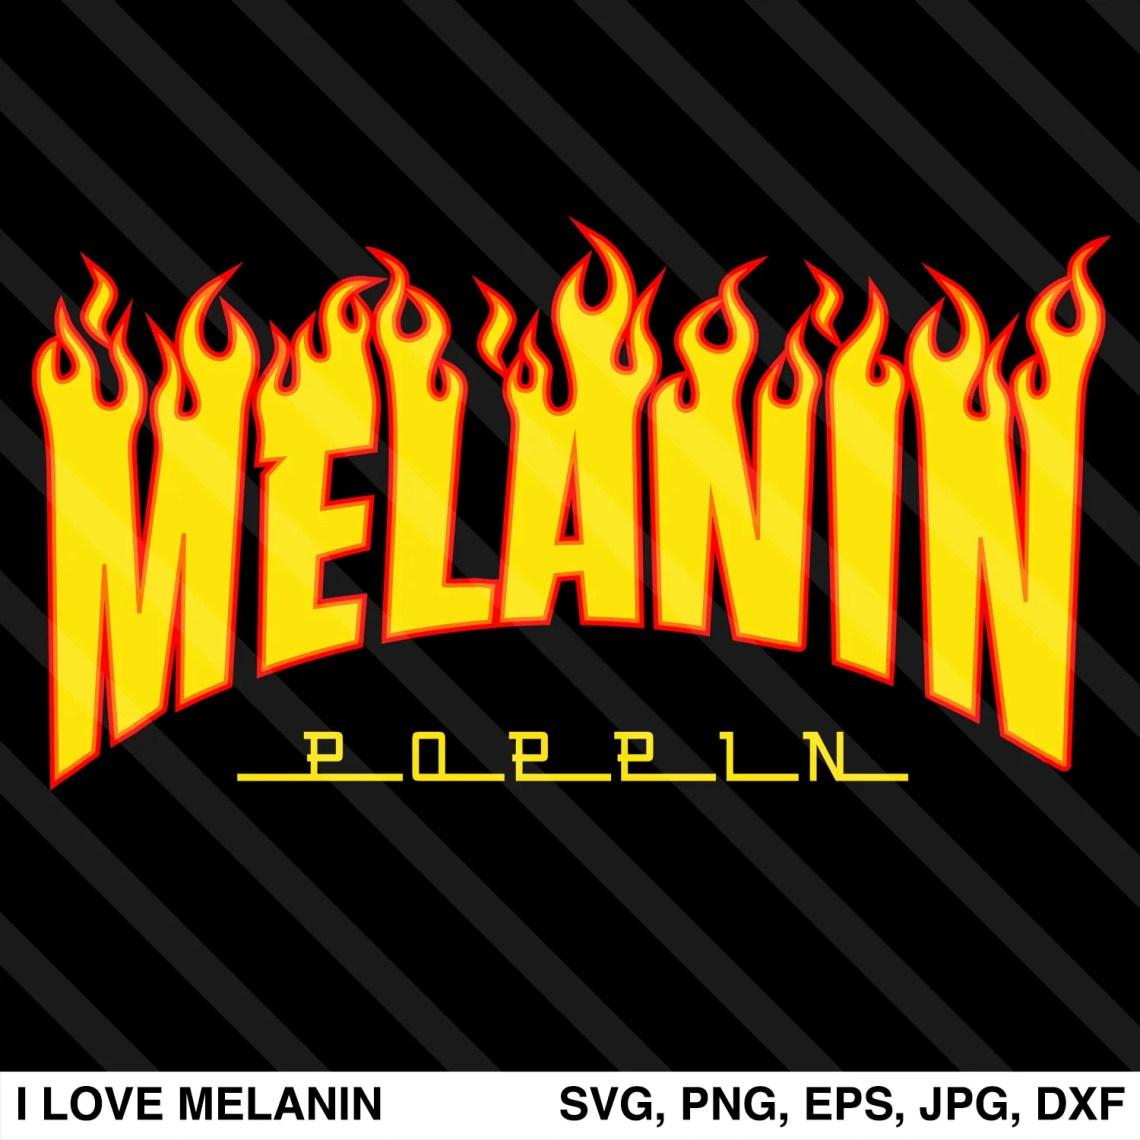 Download Melanin Poppin Fire SVG - I Love Melanin